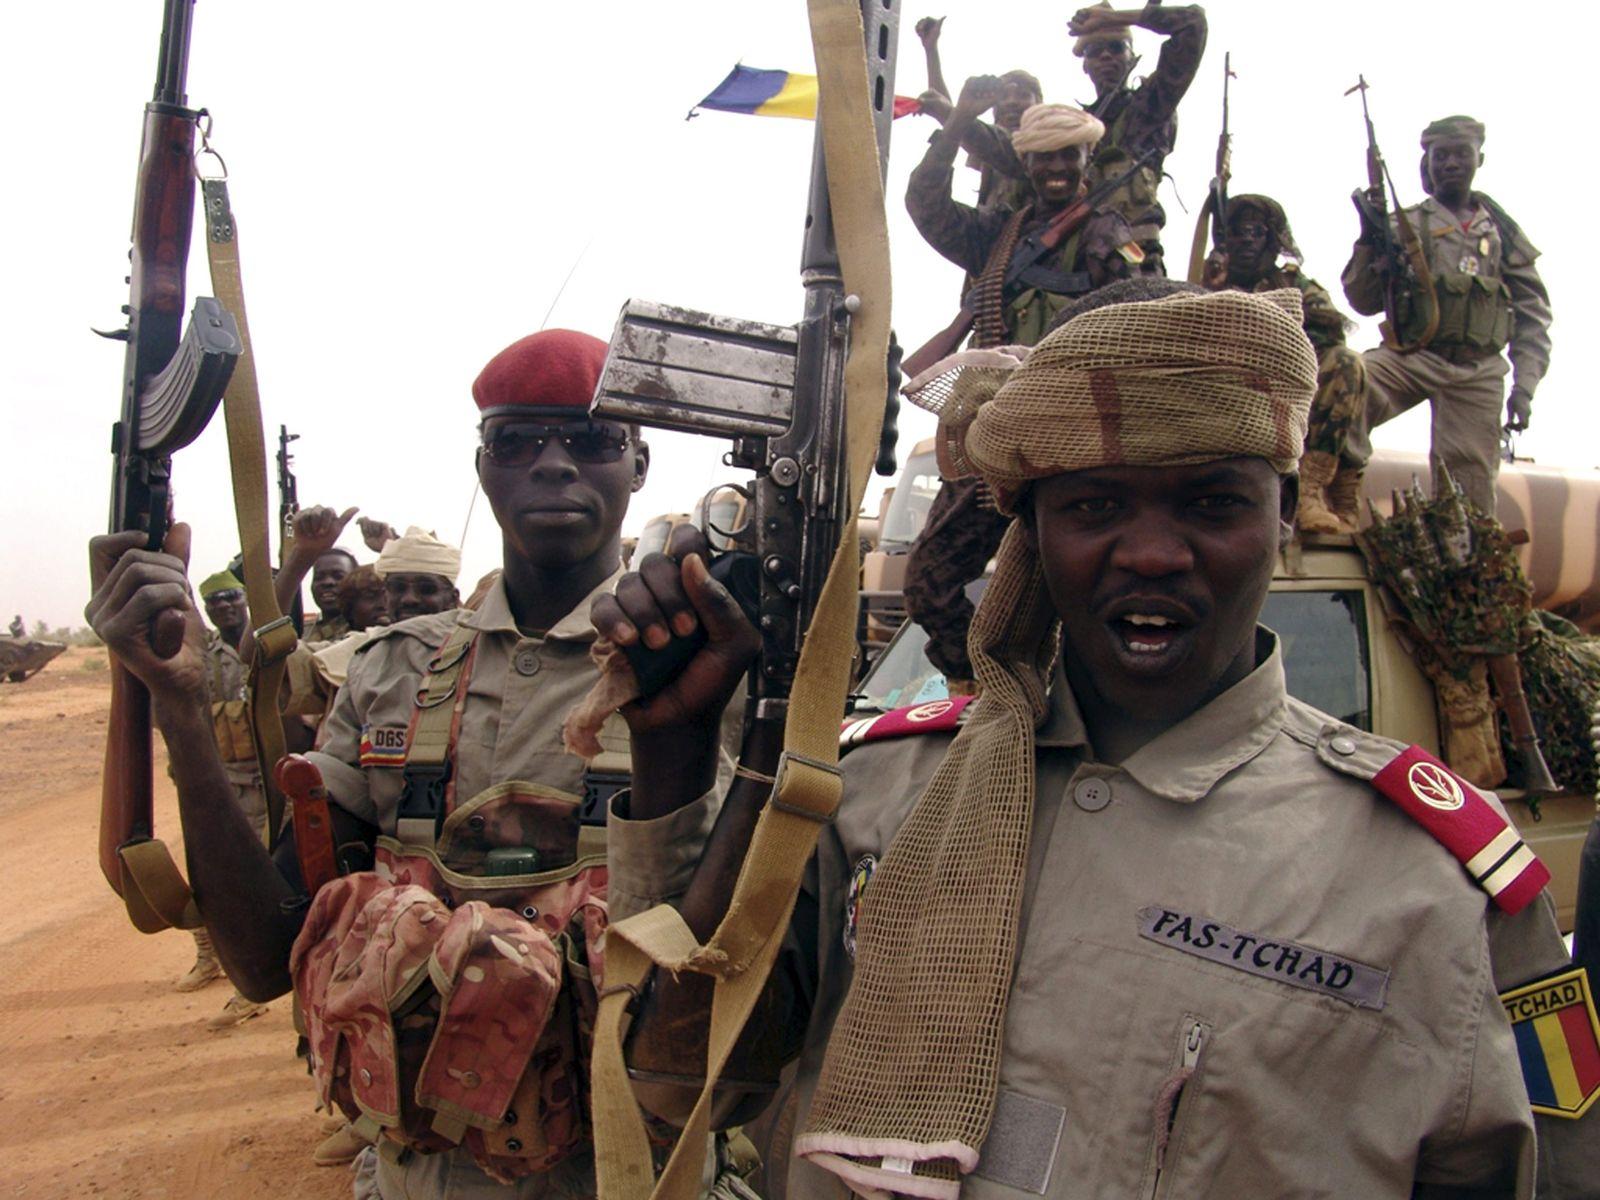 Soldaten Tschad / Mali